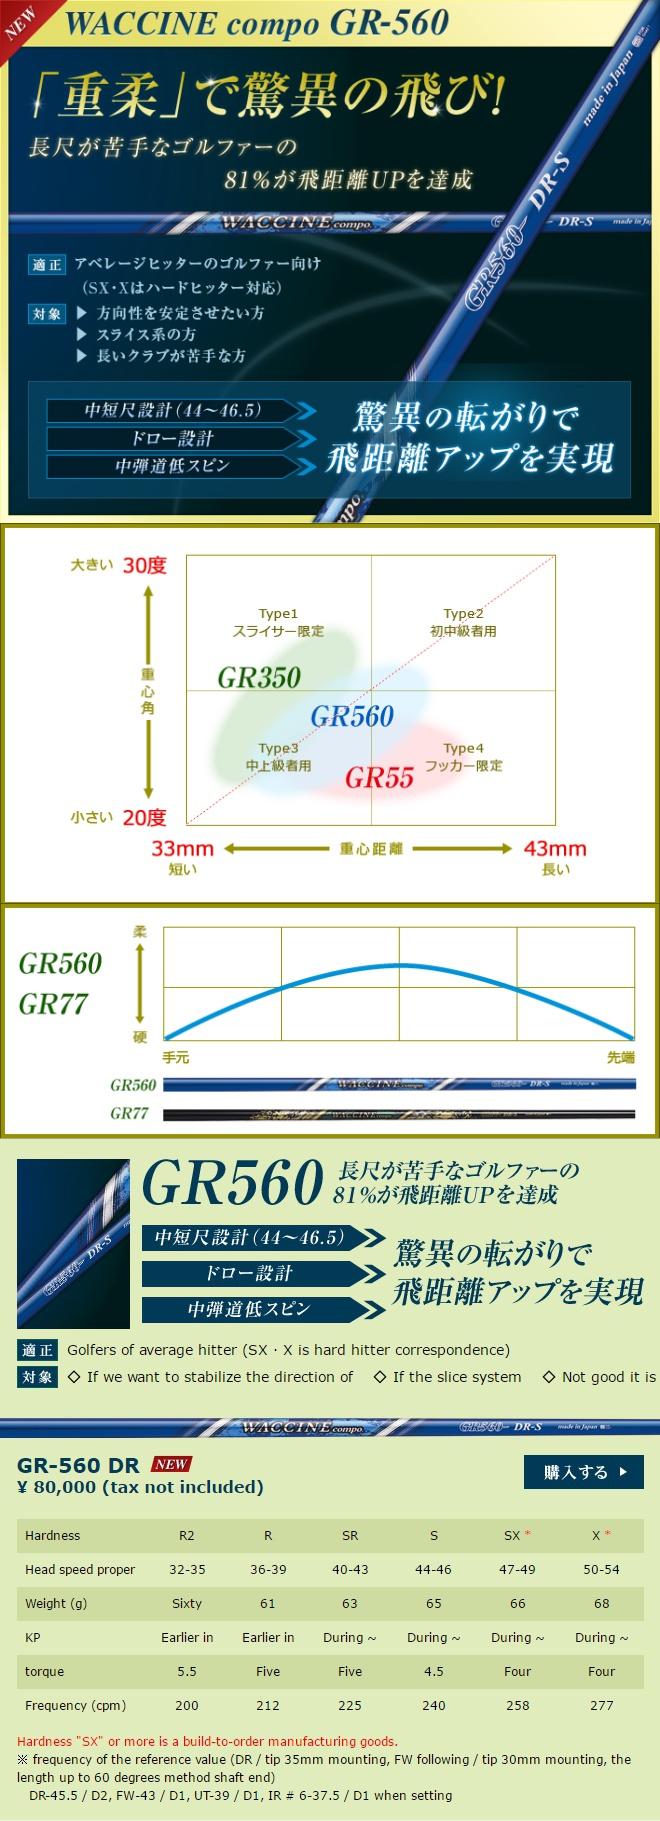 Waccine Compo GR-560 Driver Shaft